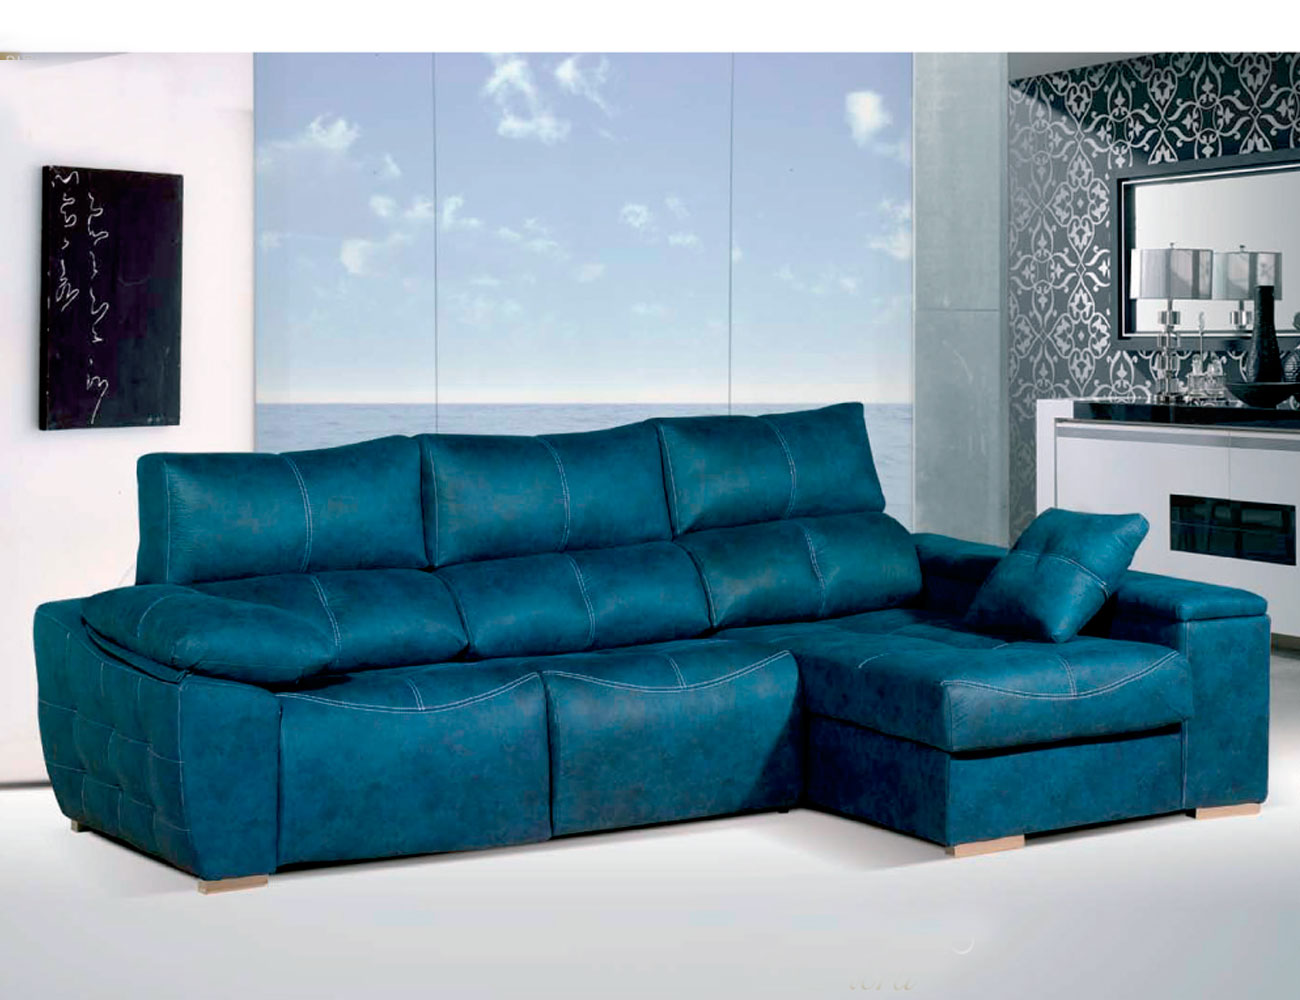 Sofa chaiselongue relax 2 motores anti manchas turquesa37